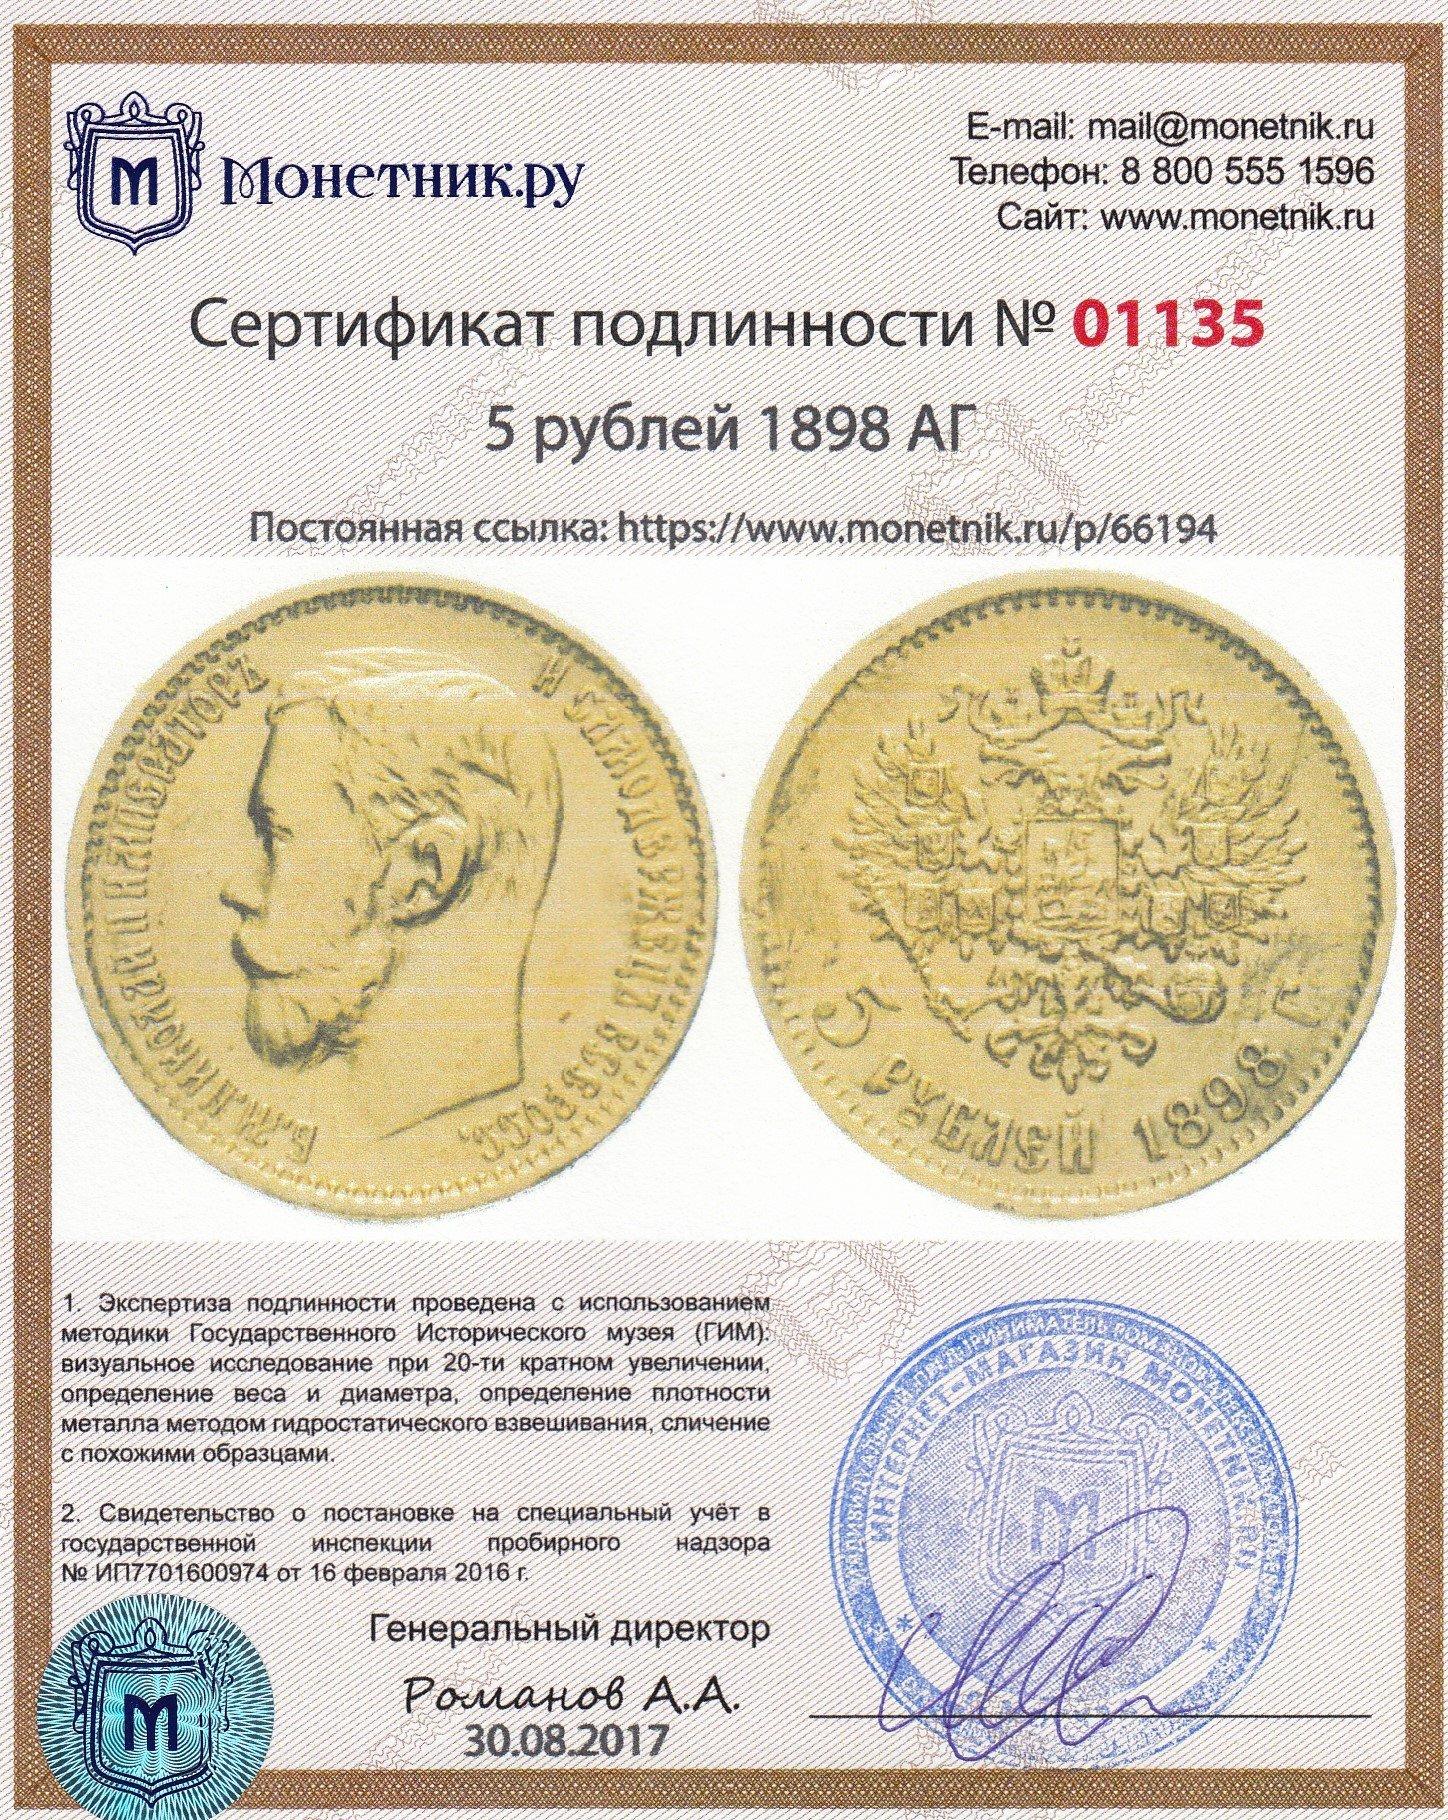 интернет магазин монетник ру по продаже монет раньше